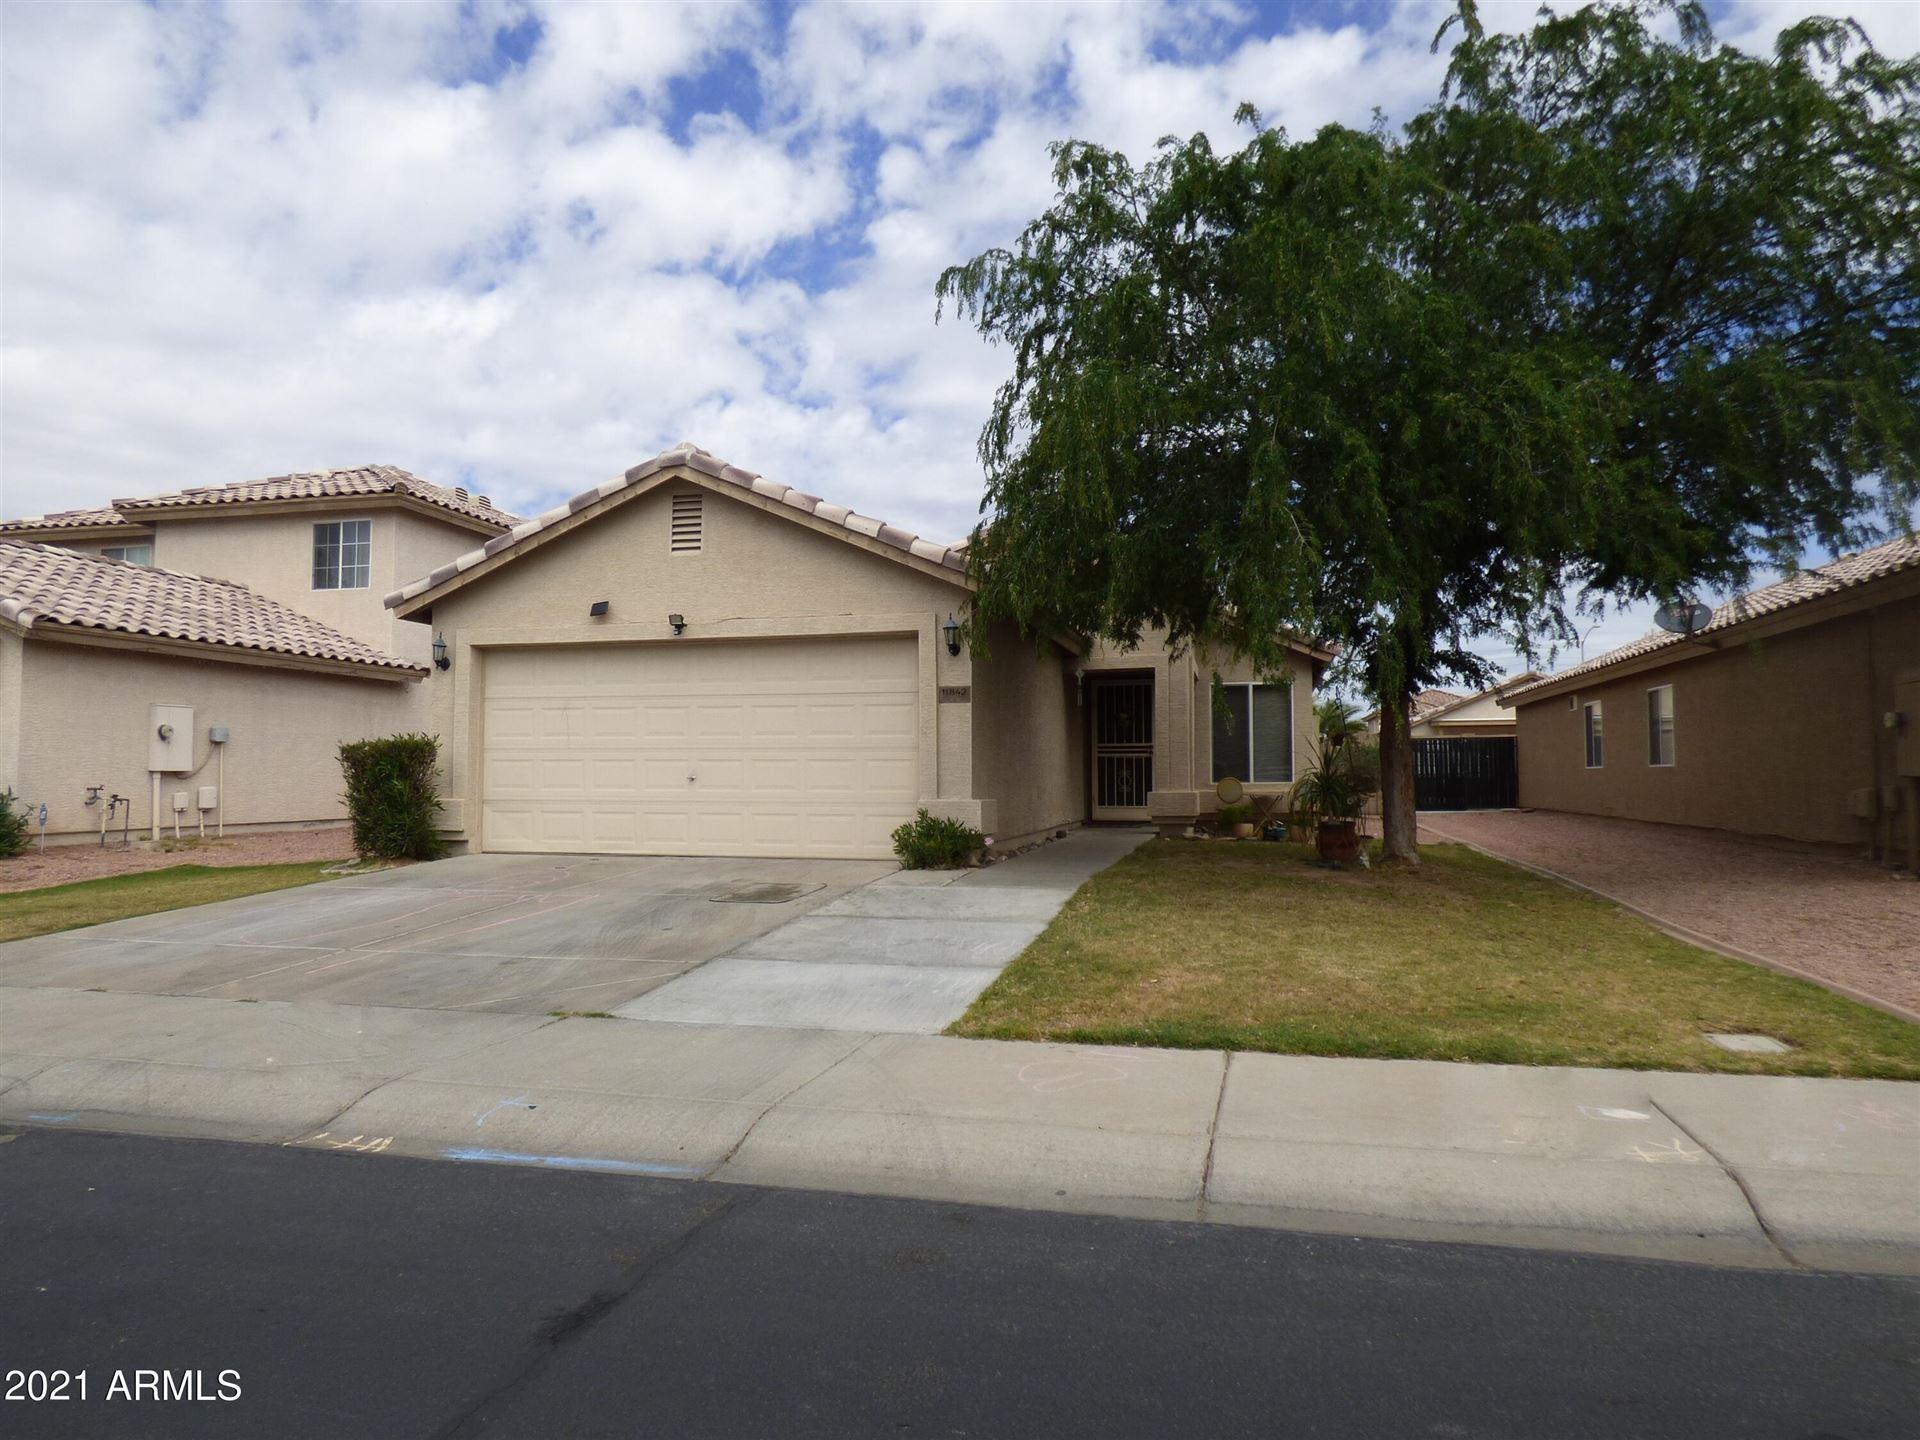 Photo of 11842 W Paradise Drive, El Mirage, AZ 85335 (MLS # 6228563)